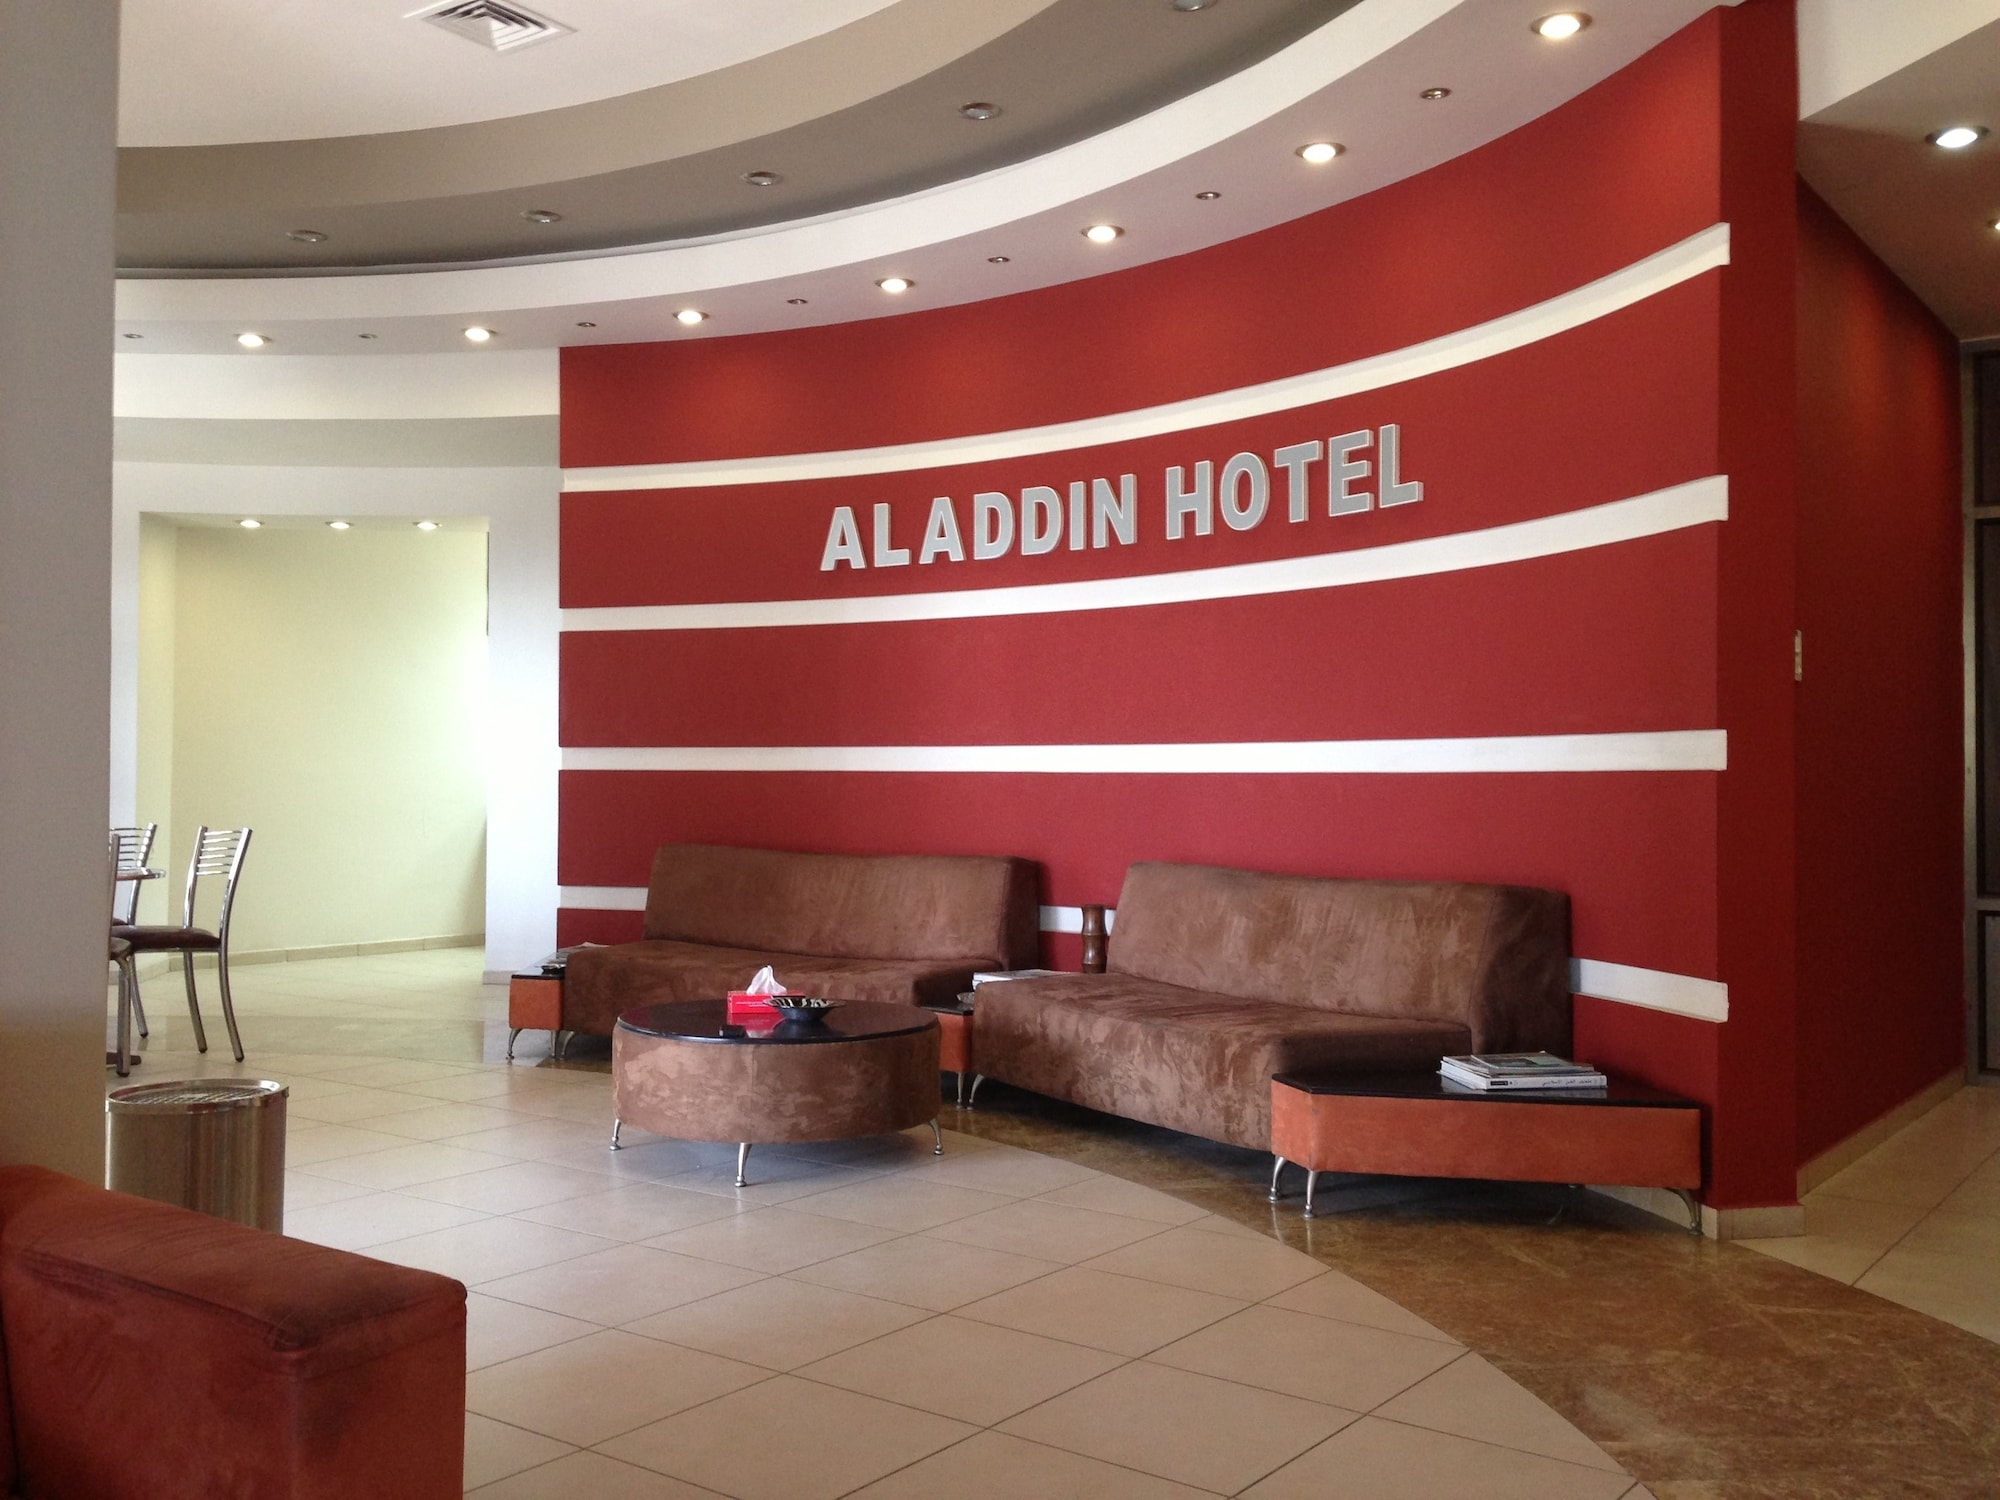 Aladdin Hotel, Ramallah and Al-Bireh